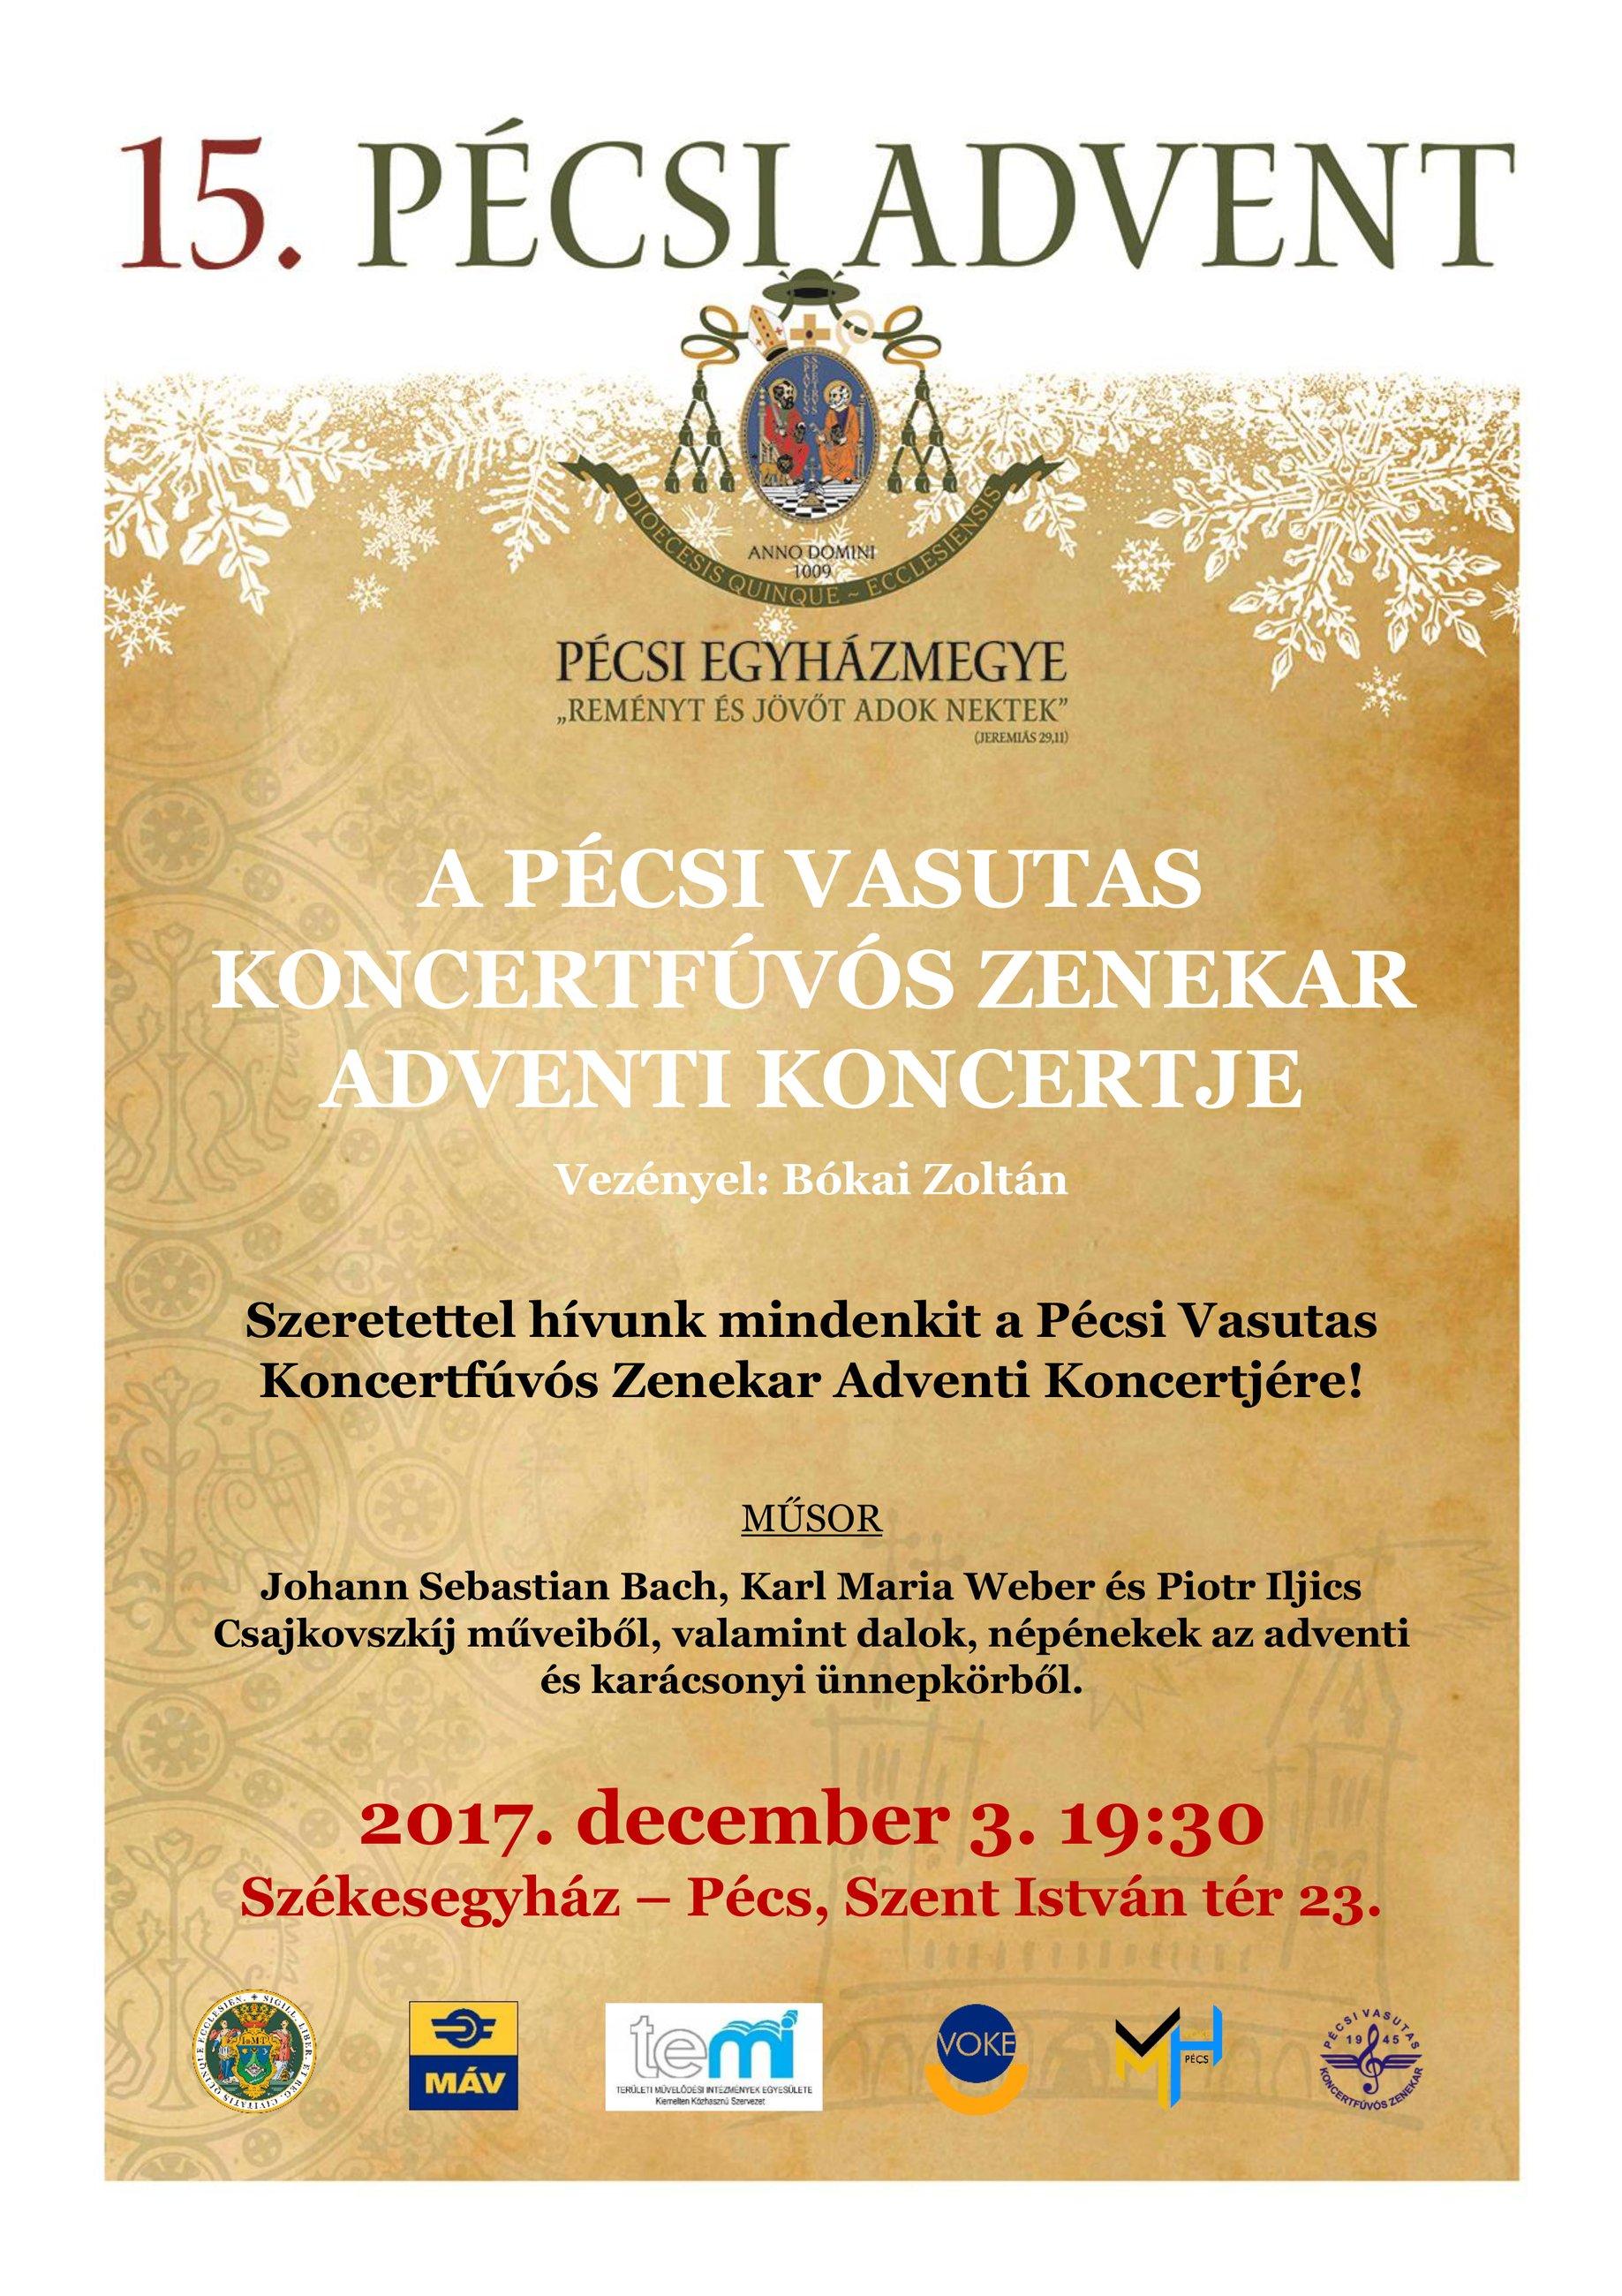 Pécsi Vasutas Koncertfúvós Zenekar 2017-es Adventi Koncertje